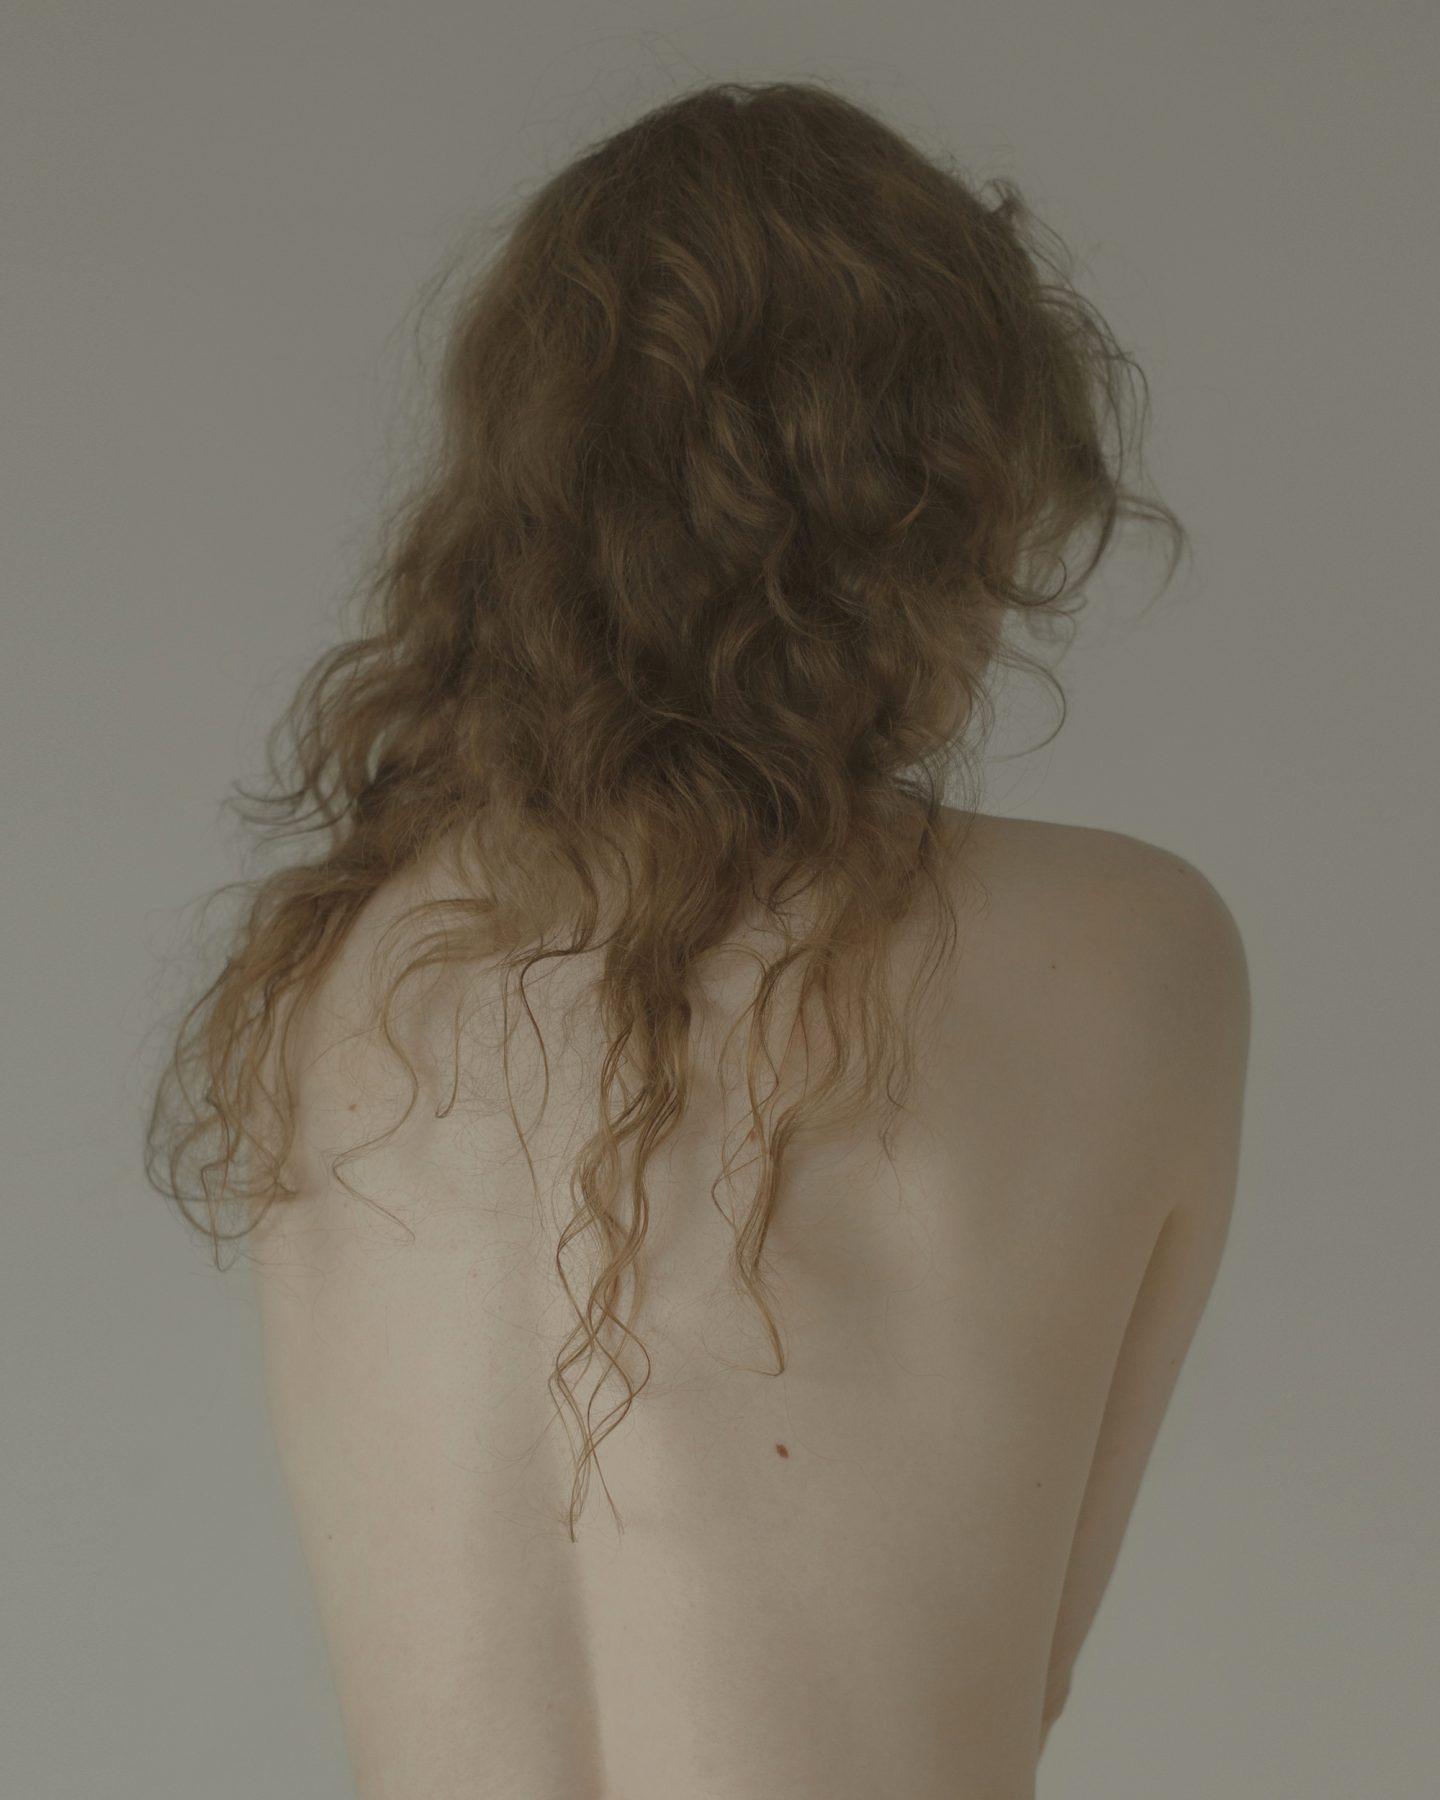 IGNANT-Photography-Alexandre-Souêtre-012